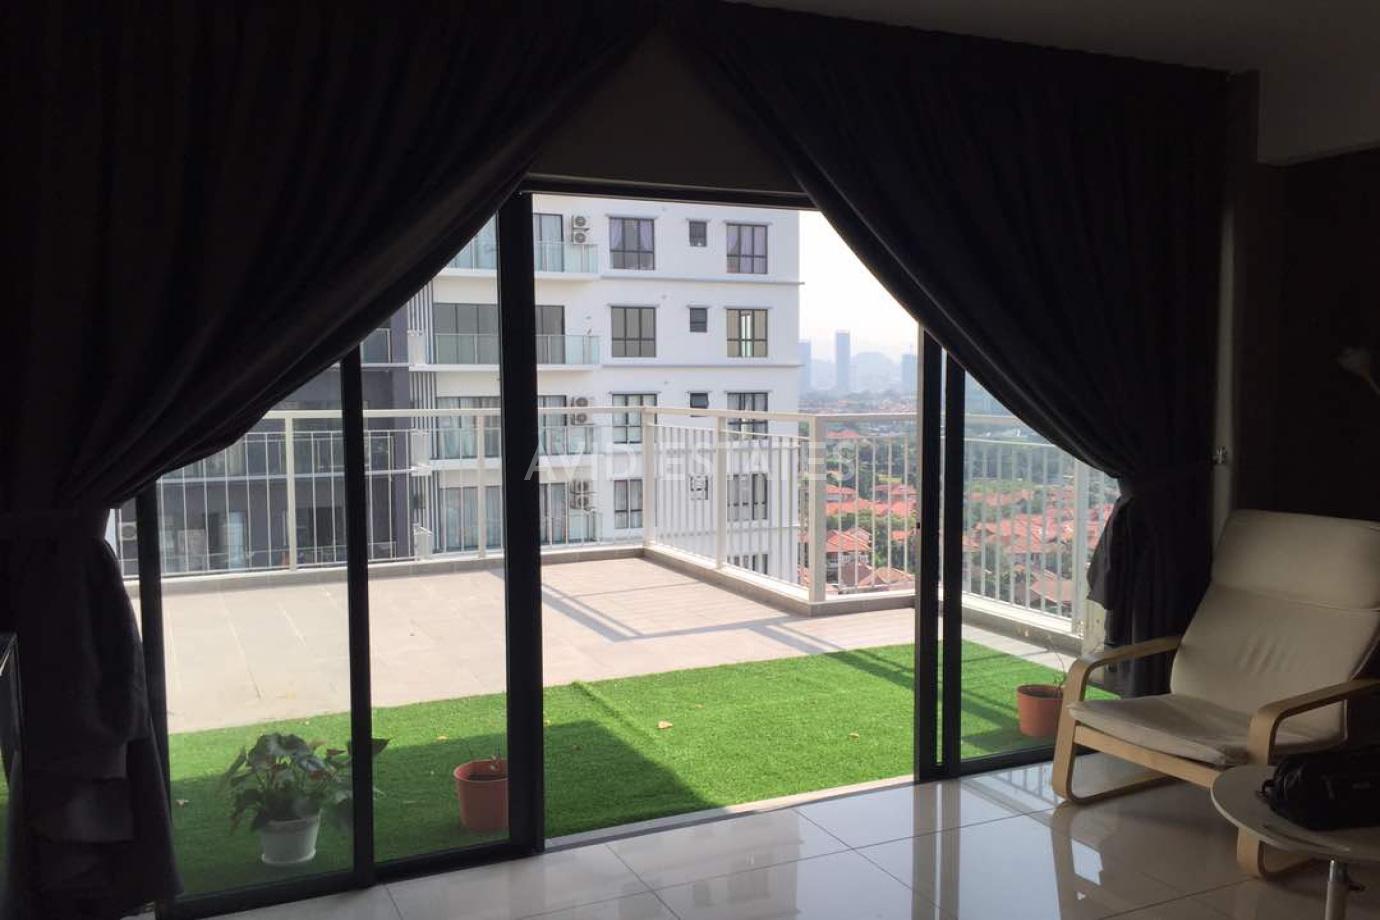 Maisson, Ara Damansara,Selangor, 3 Bedrooms Bedrooms, ,Condominium / Serviced Residence,For Sale,4-17-07, Maisson Ara Damansara, Jalan PJU 1a/3, 47,1465